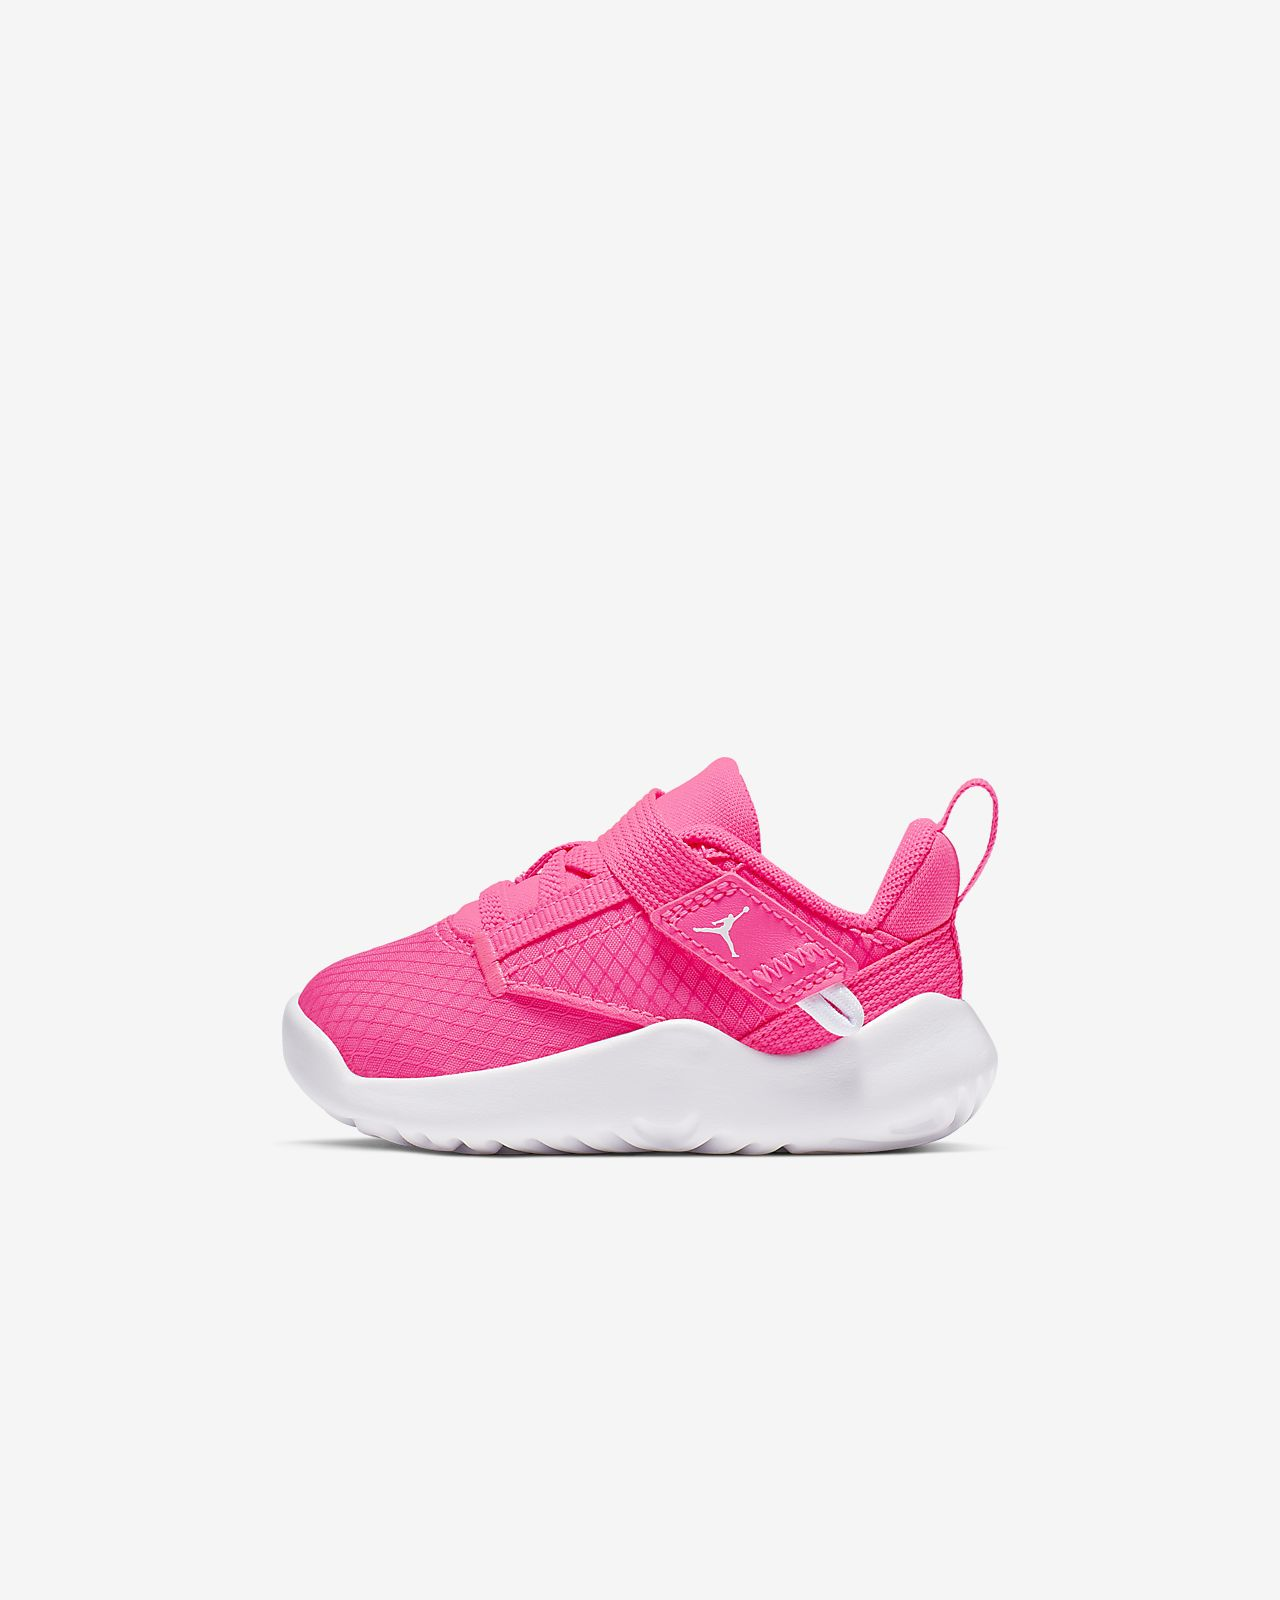 71cf397d59ab Jordan Proto 23 Baby Toddler Shoe. Nike.com